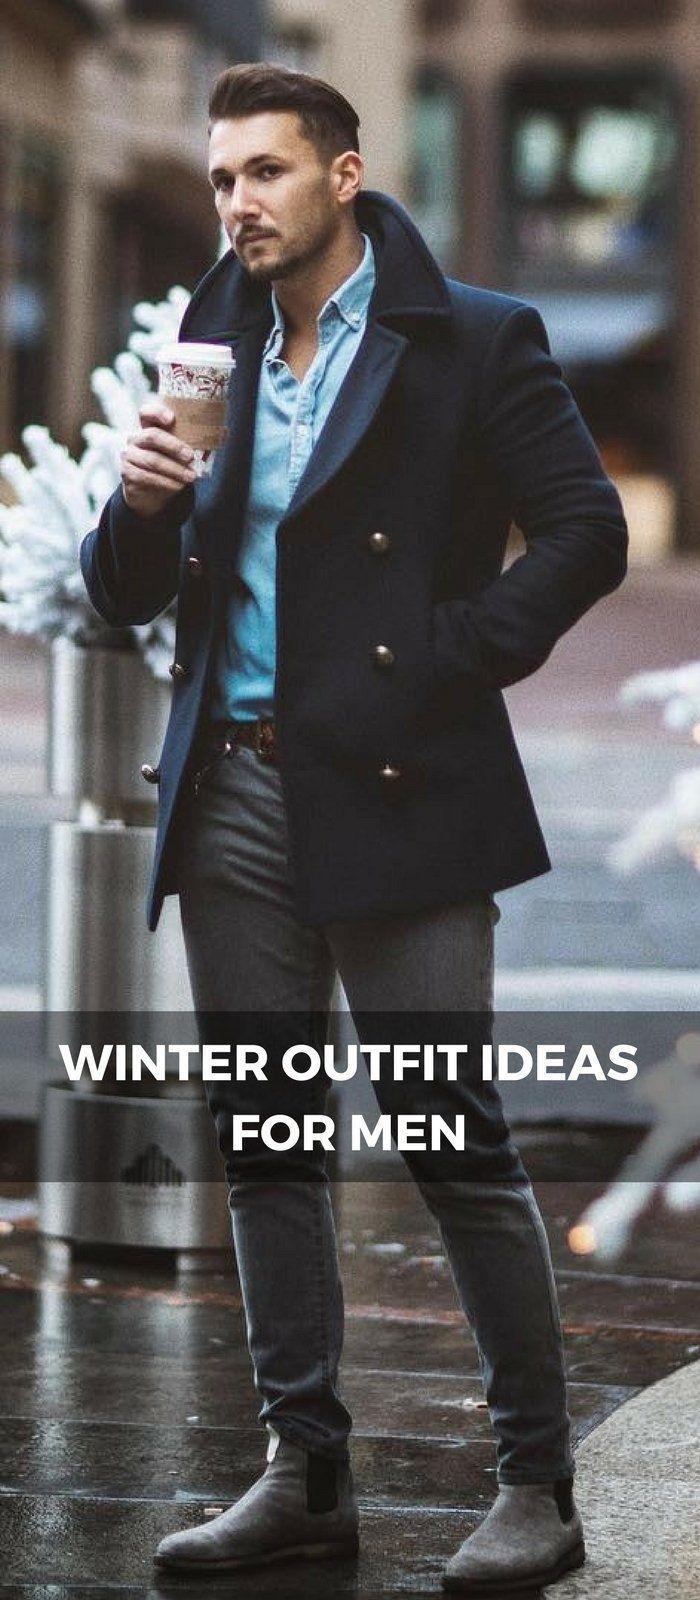 Winter outfit ideas for men #FashionableMensJackets